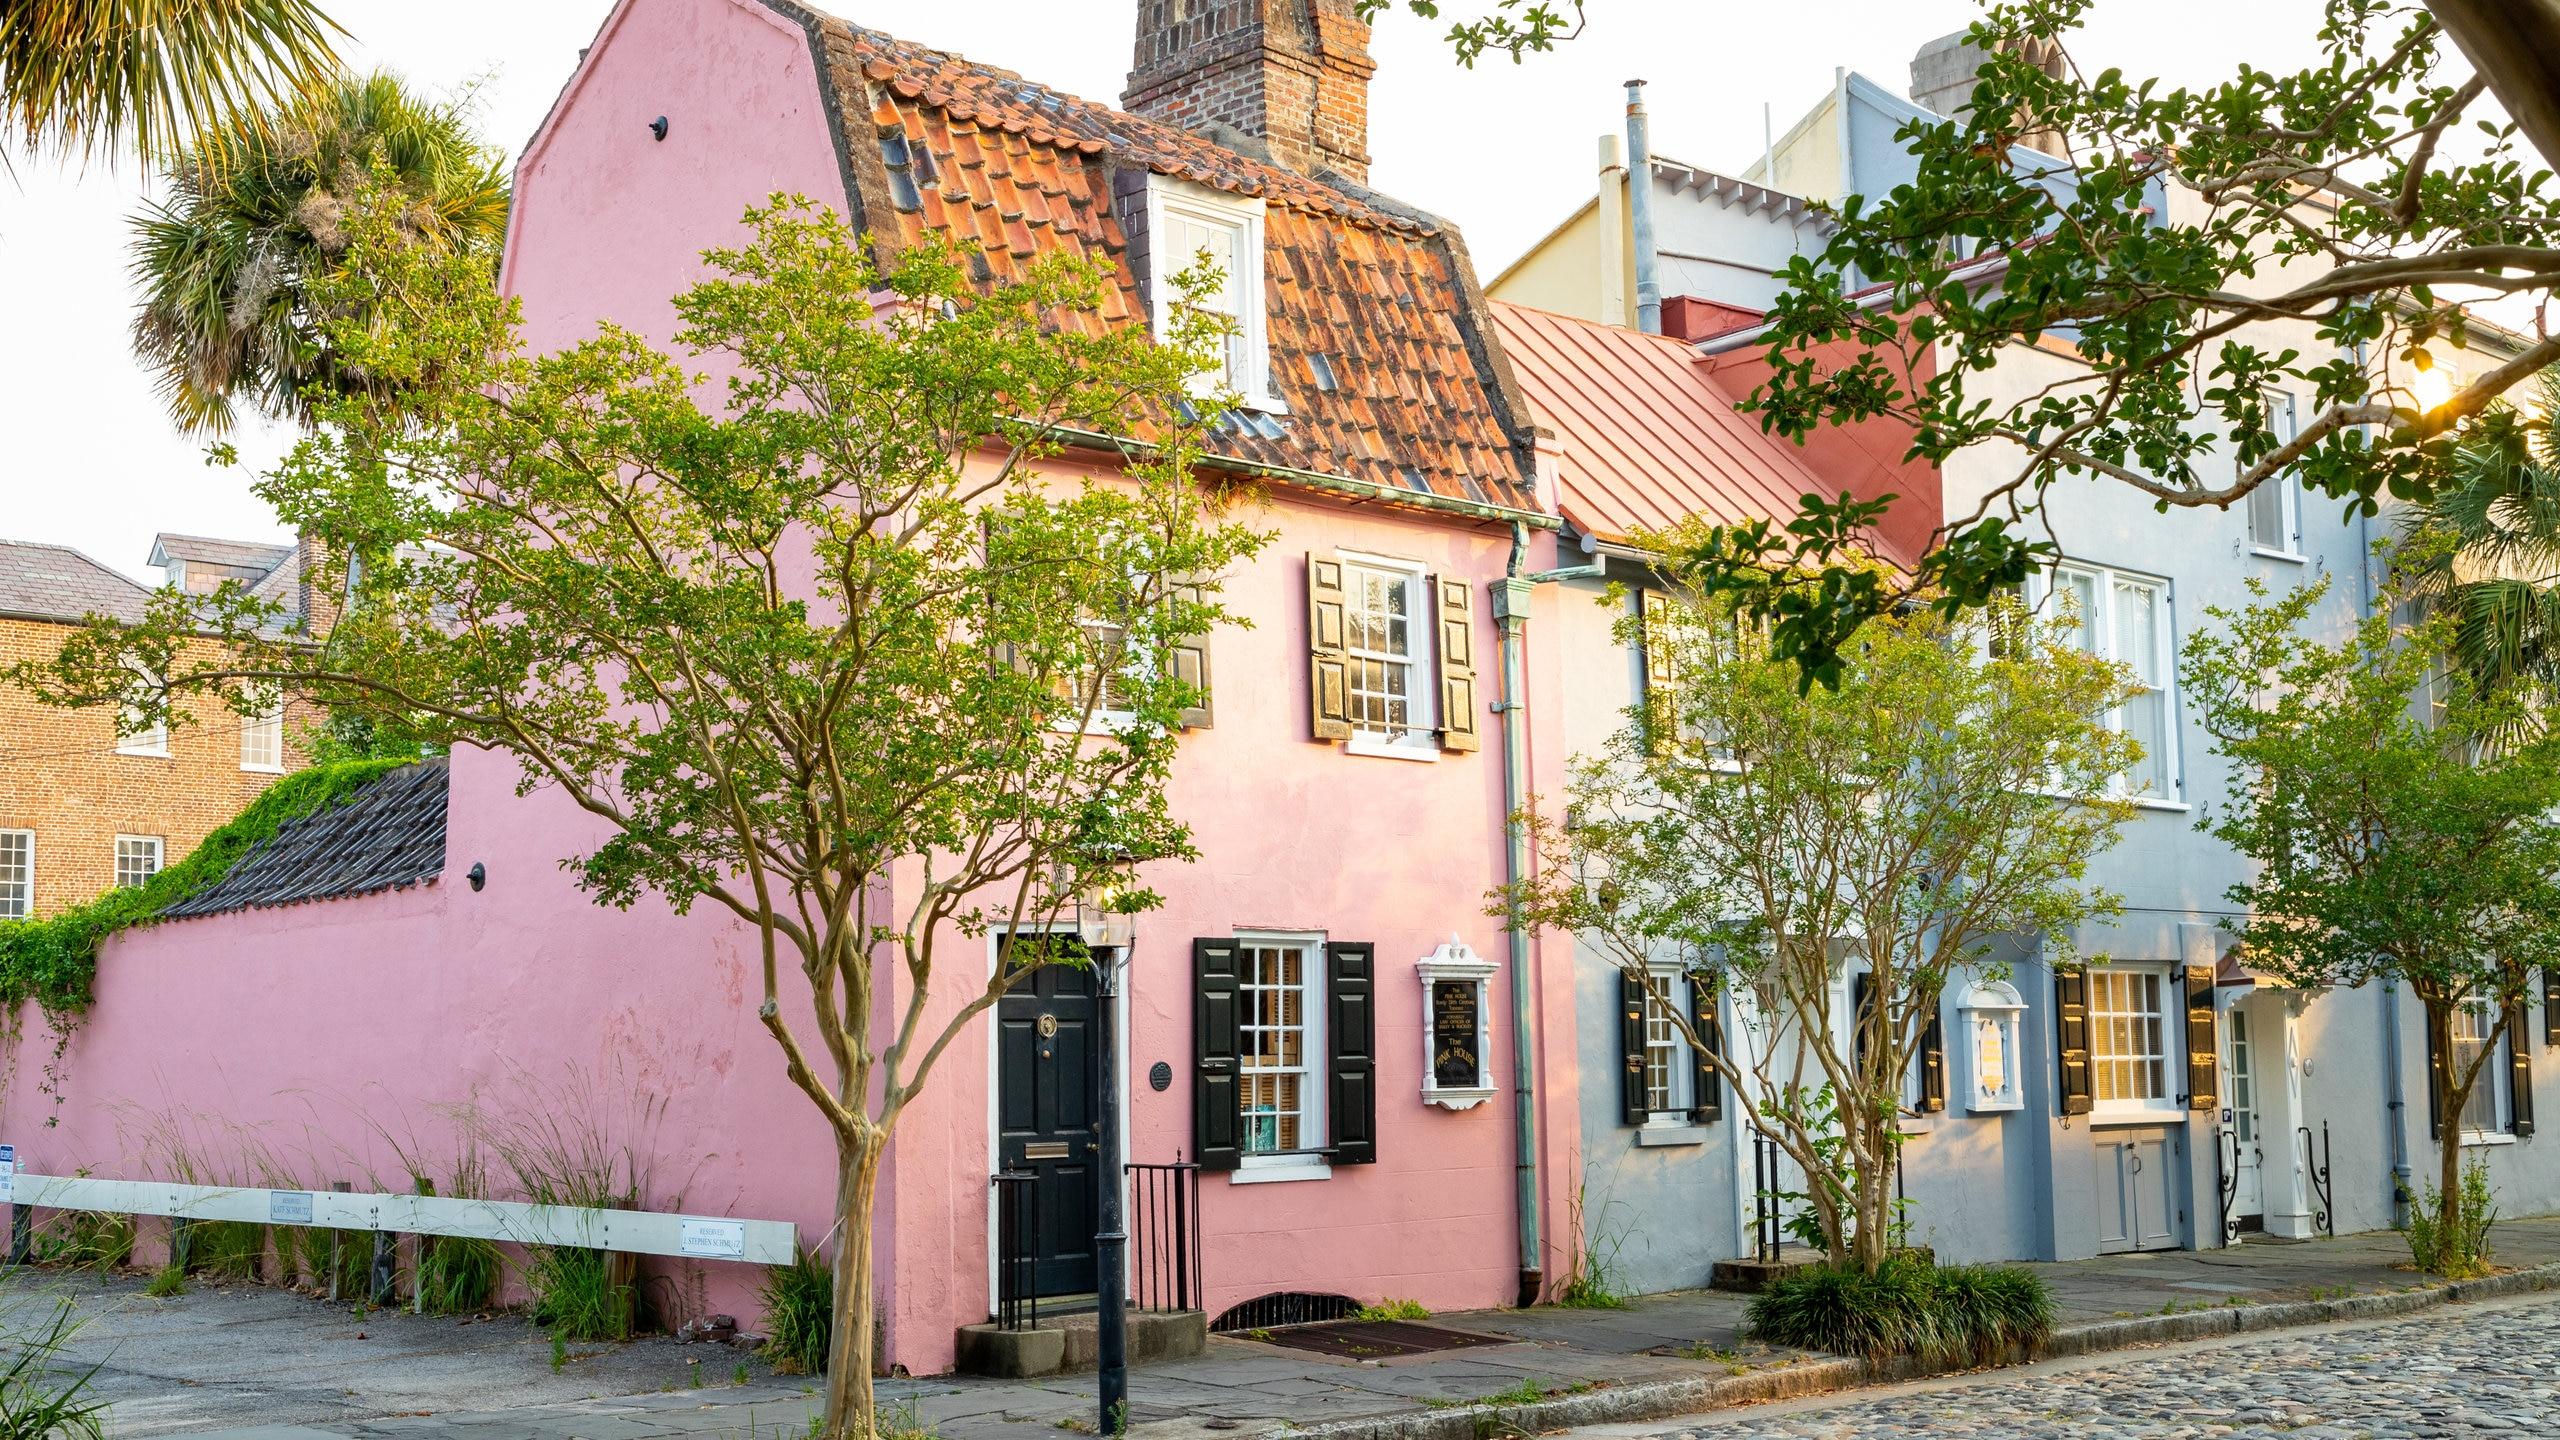 Pink House Gallery, Charleston, South Carolina, United States of America